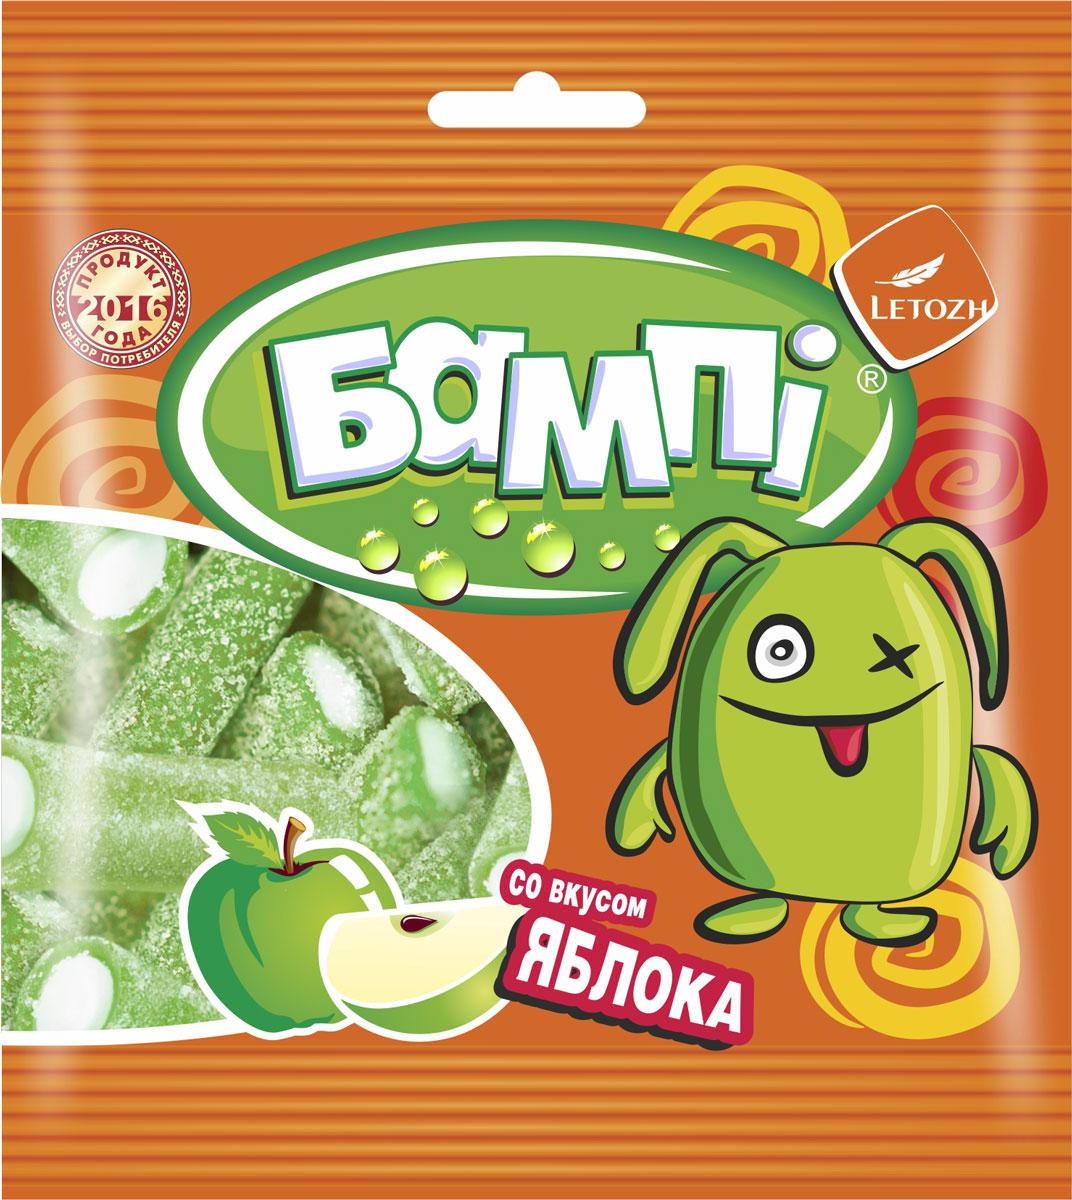 Бампi мармеладные трубочки со вкусом зеленого яблока, 75 г pomorzanka макарена мармеладные дольки 200 г